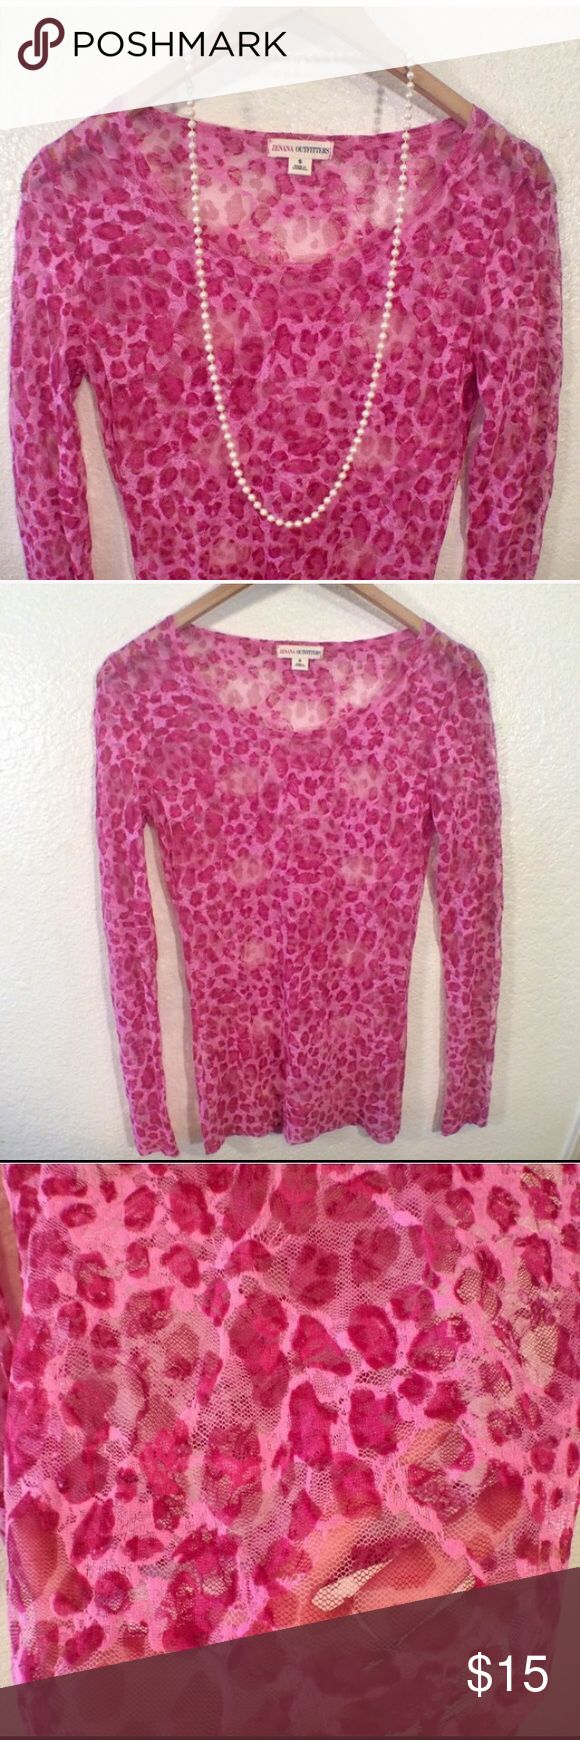 Pink leopard print bedding - Pink Leopard Mesh Top Super Cute